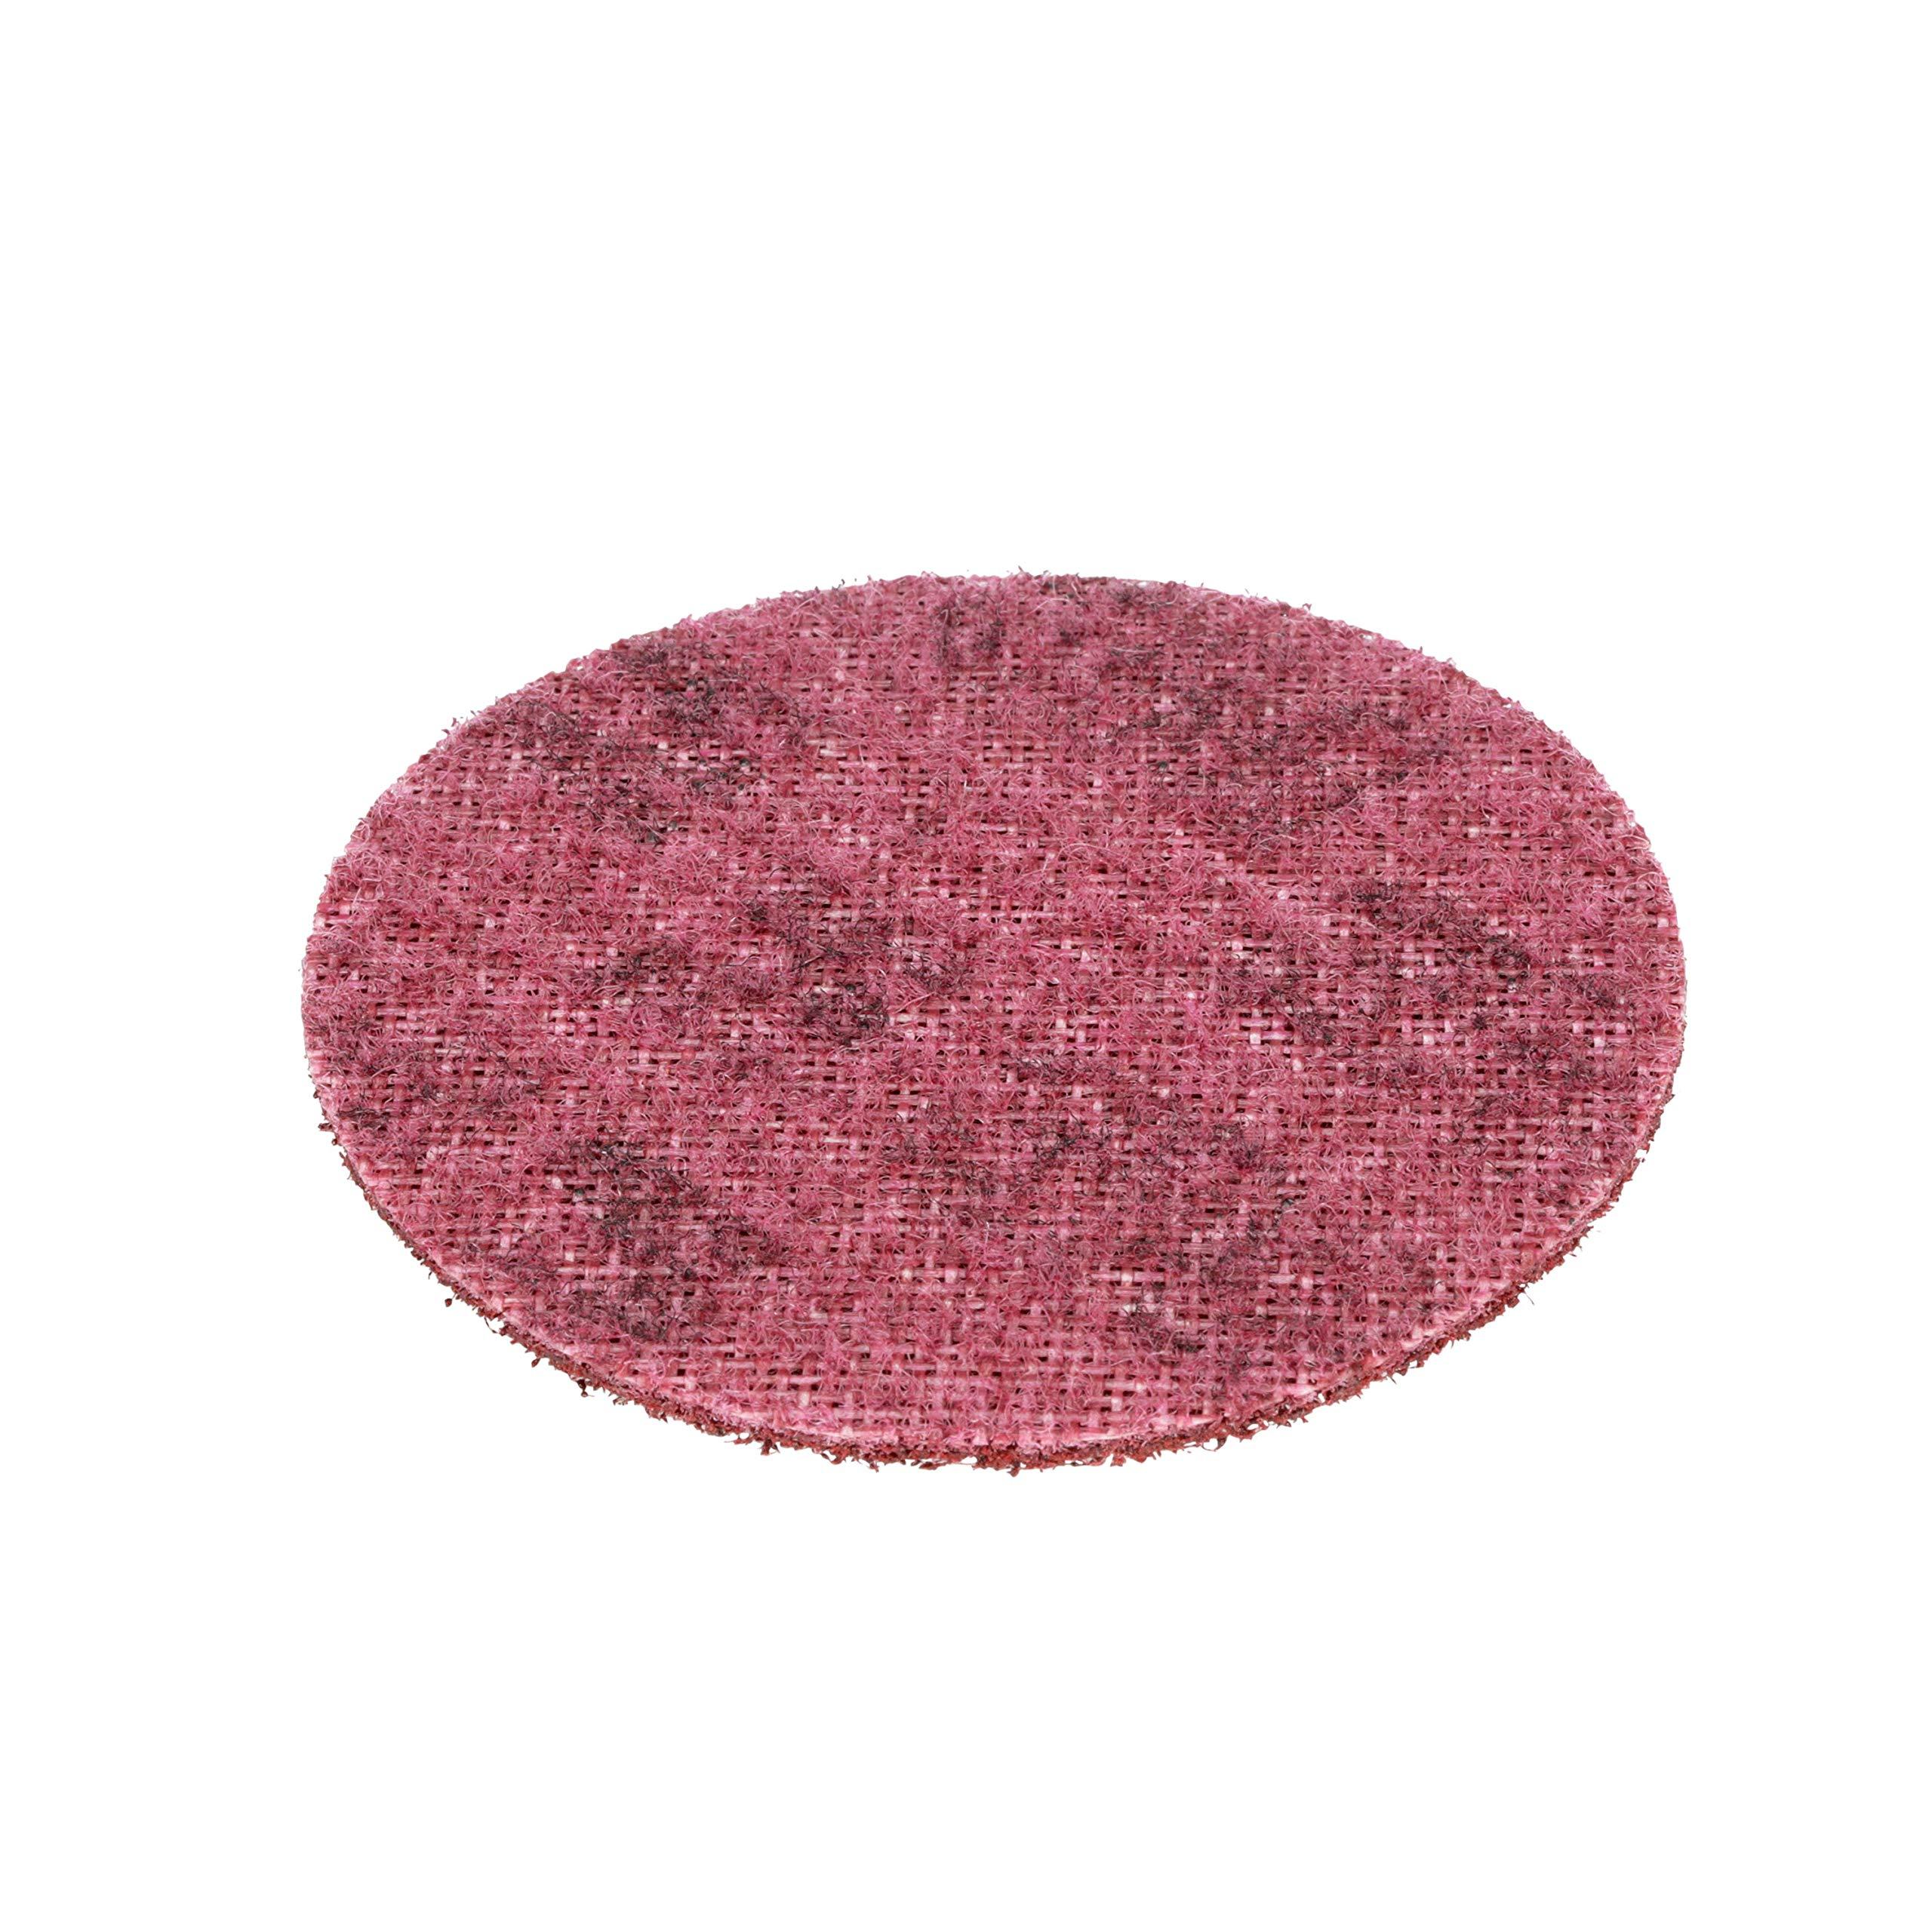 Scotch-Brite(TM) Surface Conditioning Disc, Hook and Loop Attachment, Aluminum Oxide, 4-1/2 Diameter, Medium Grit (Pack of 10)